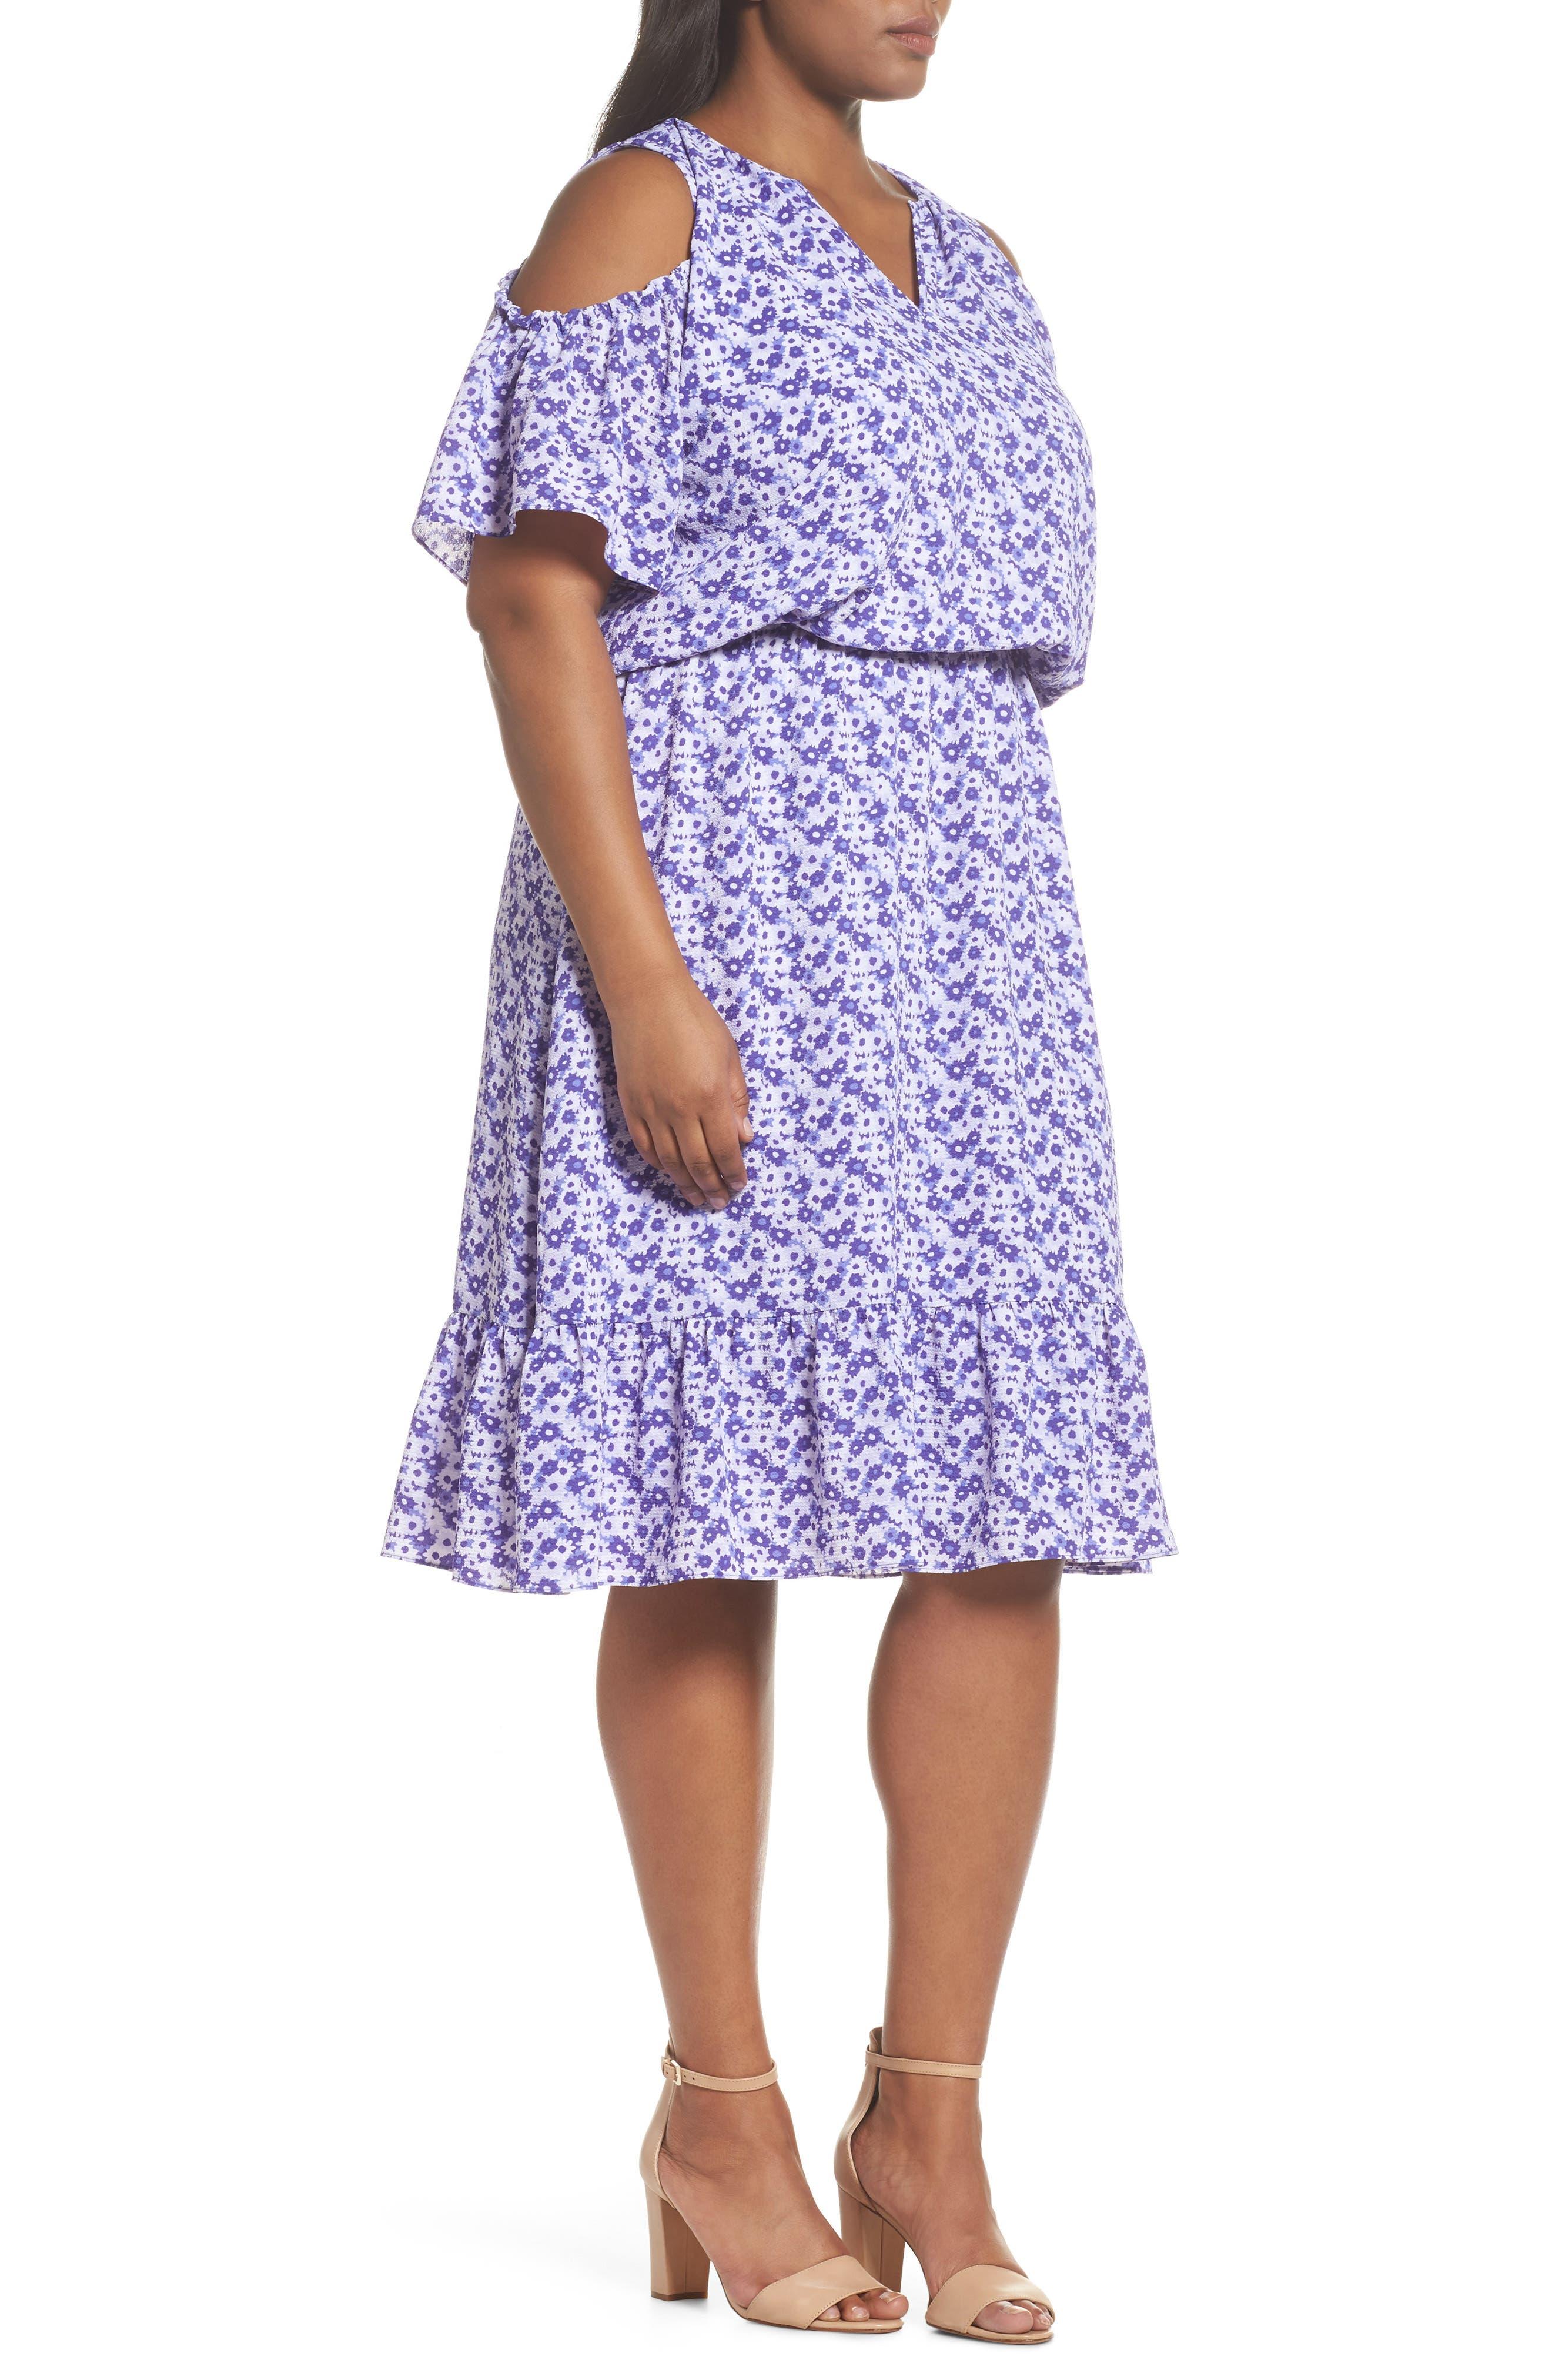 Floral Cold Shoulder Midi Dress,                             Alternate thumbnail 3, color,                             Amethyst/ Light Quartz Multi